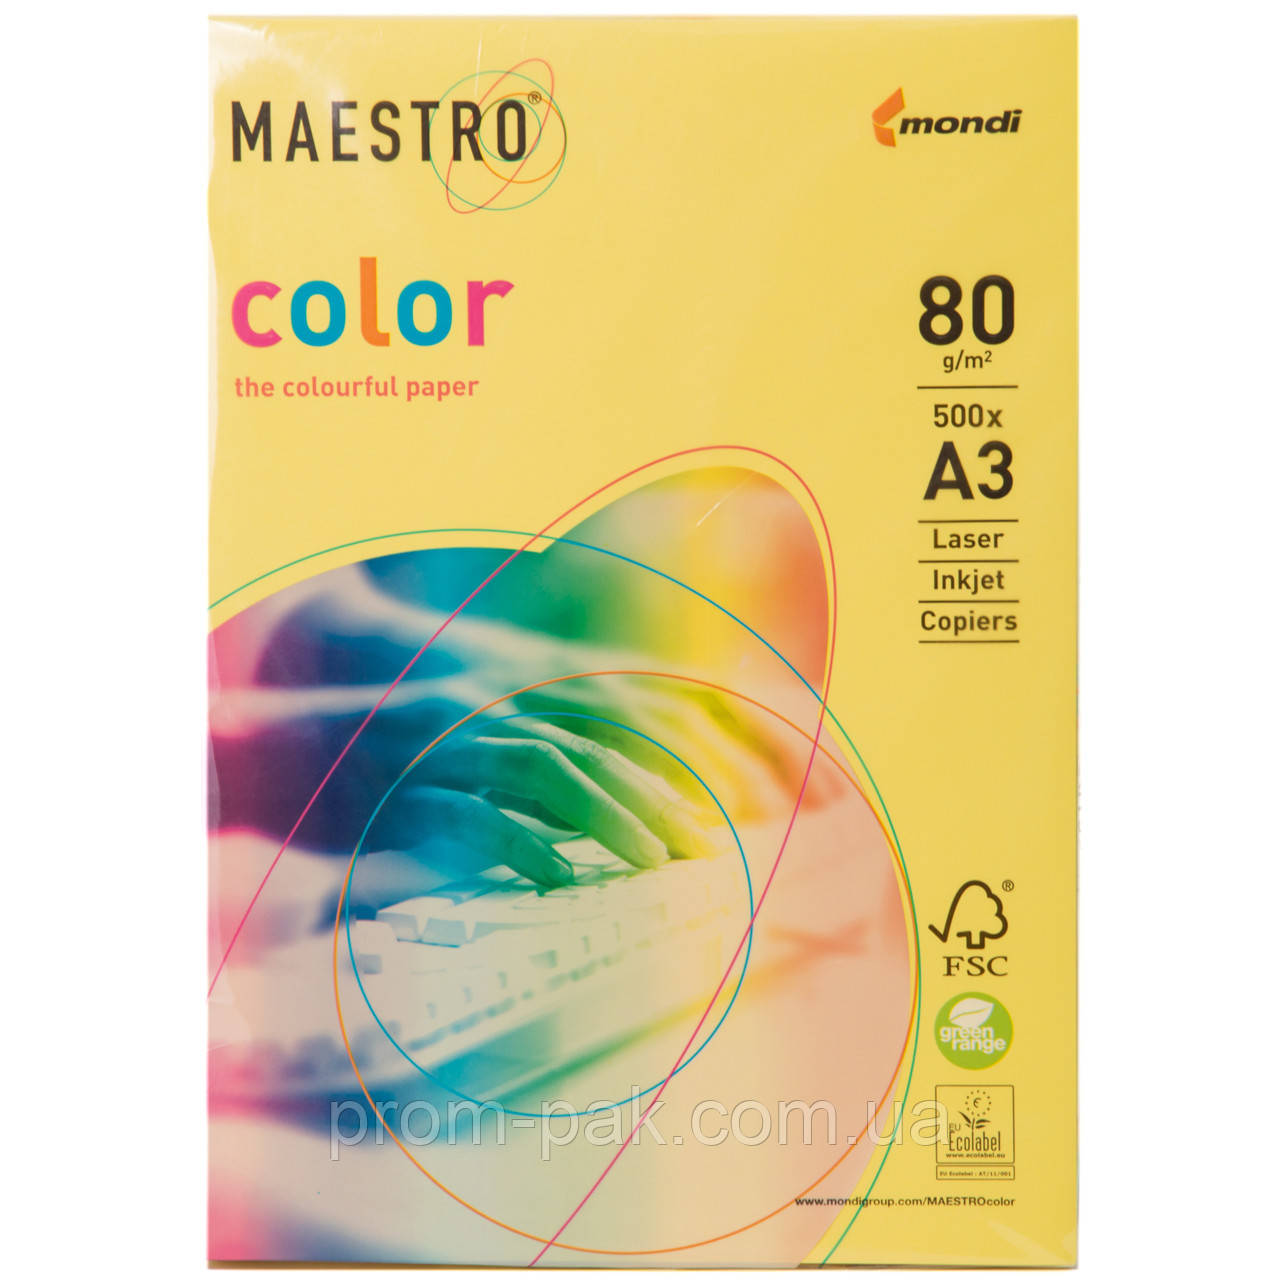 Цветная бумага Maestro А3 г/м² 80 интенсив желтый